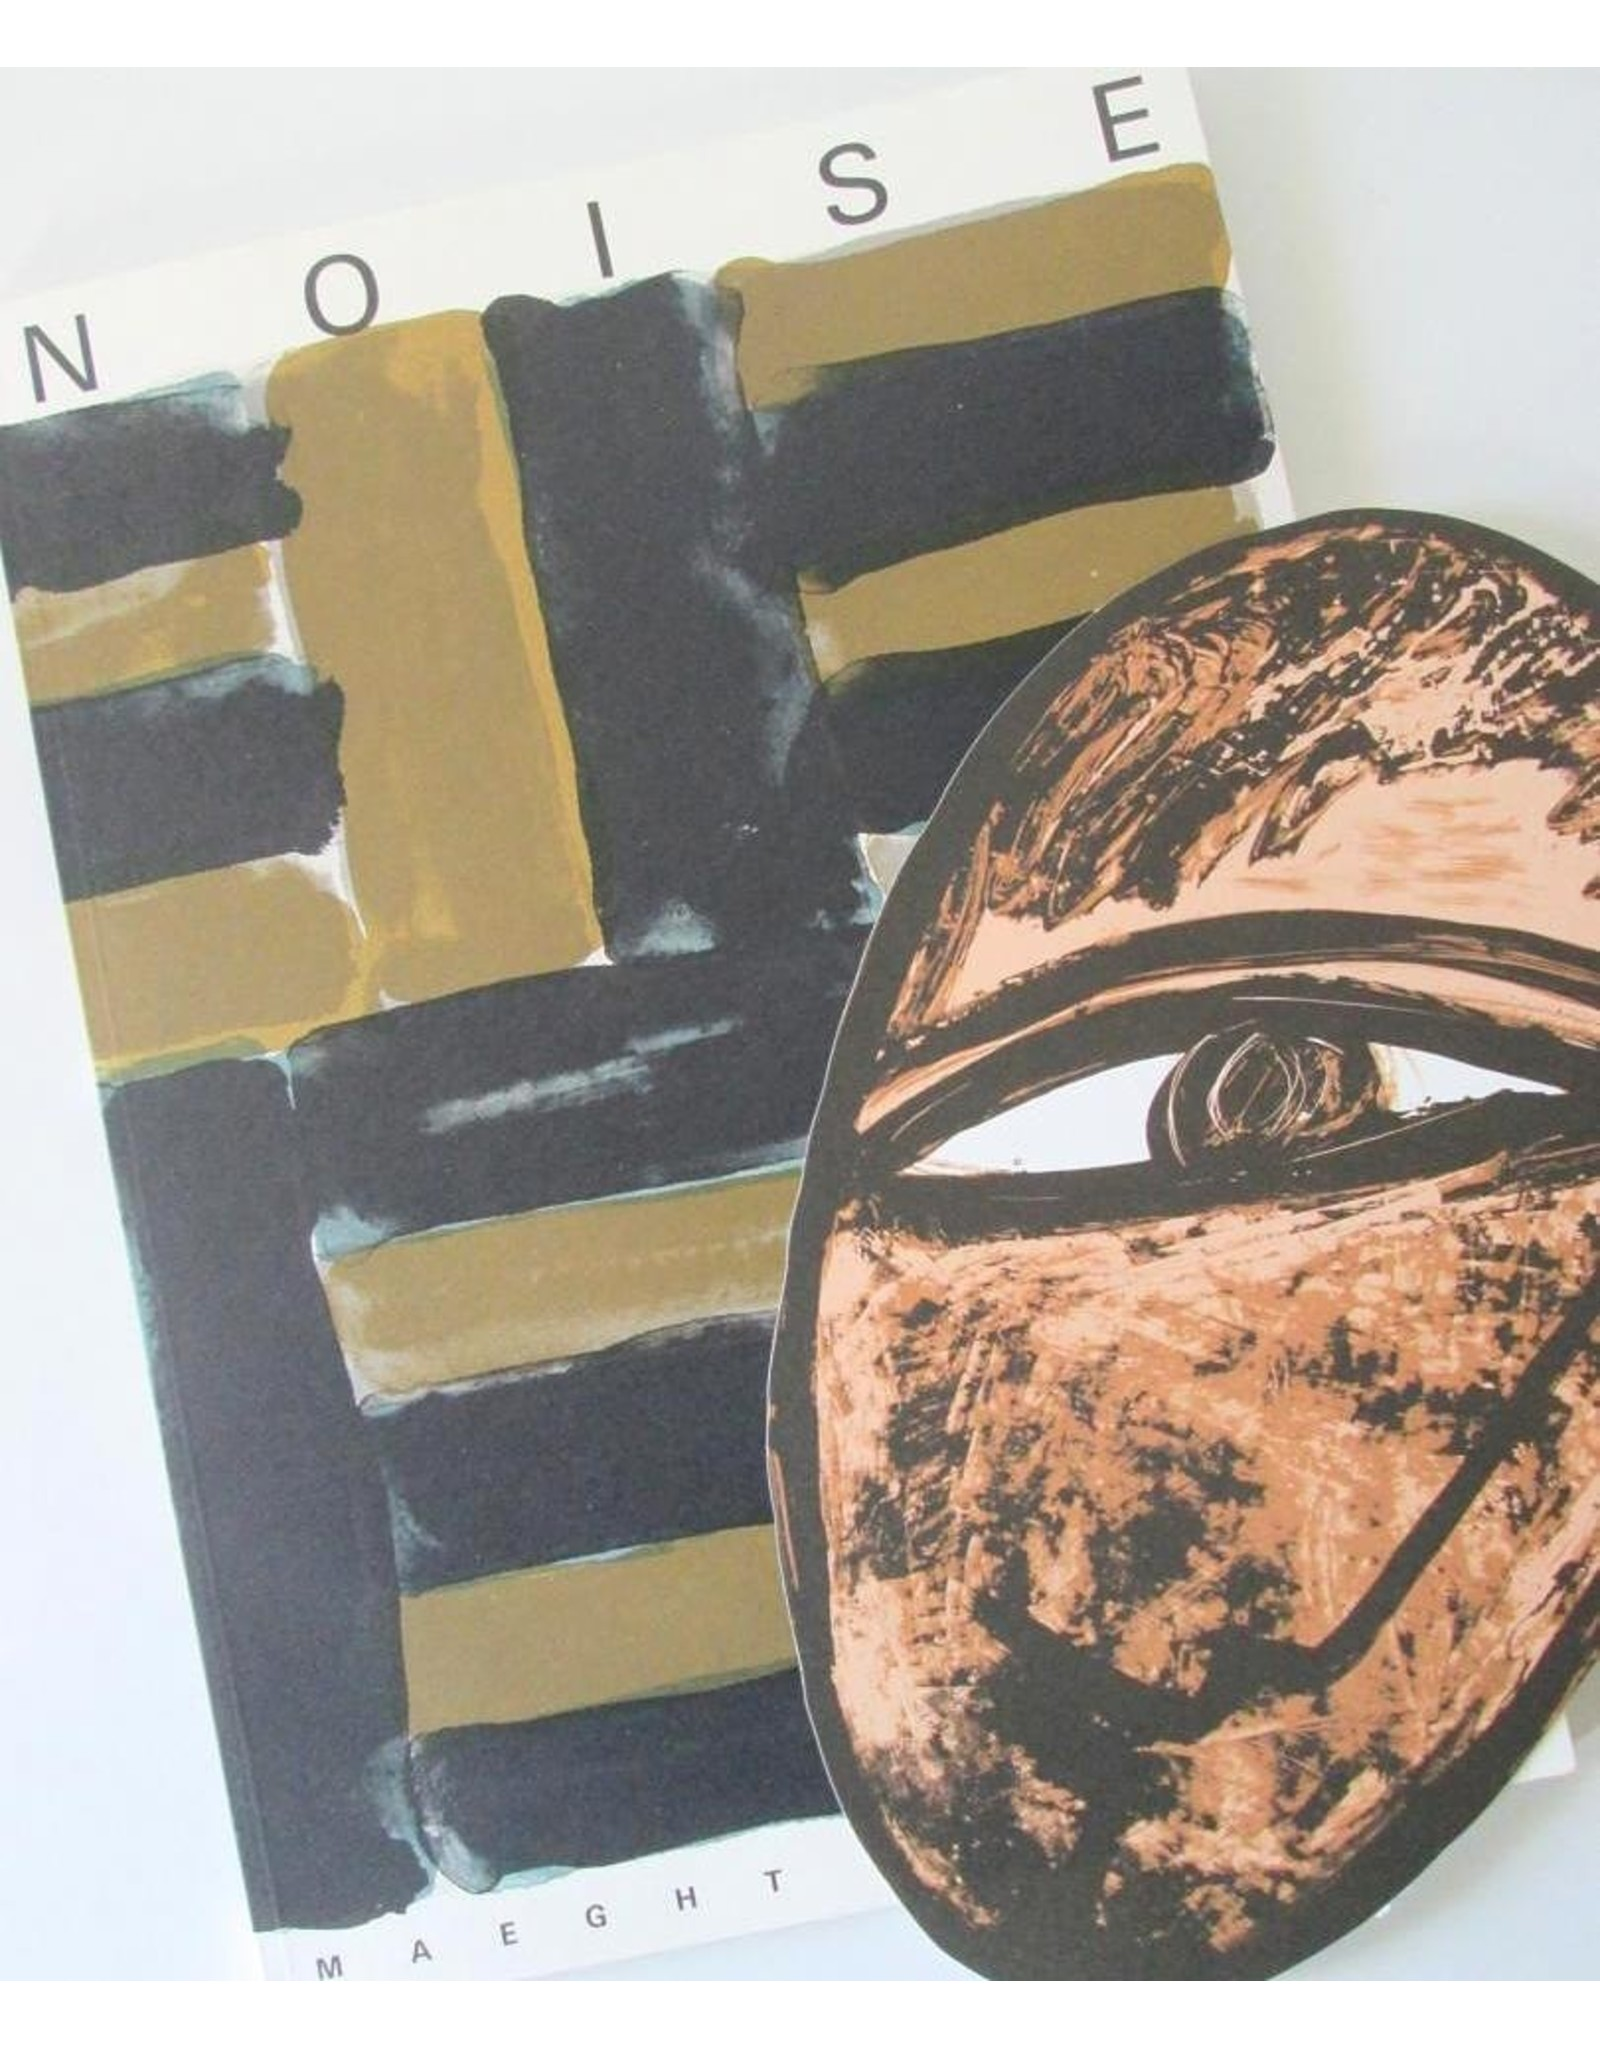 Serge Bramly - Noise No. 17